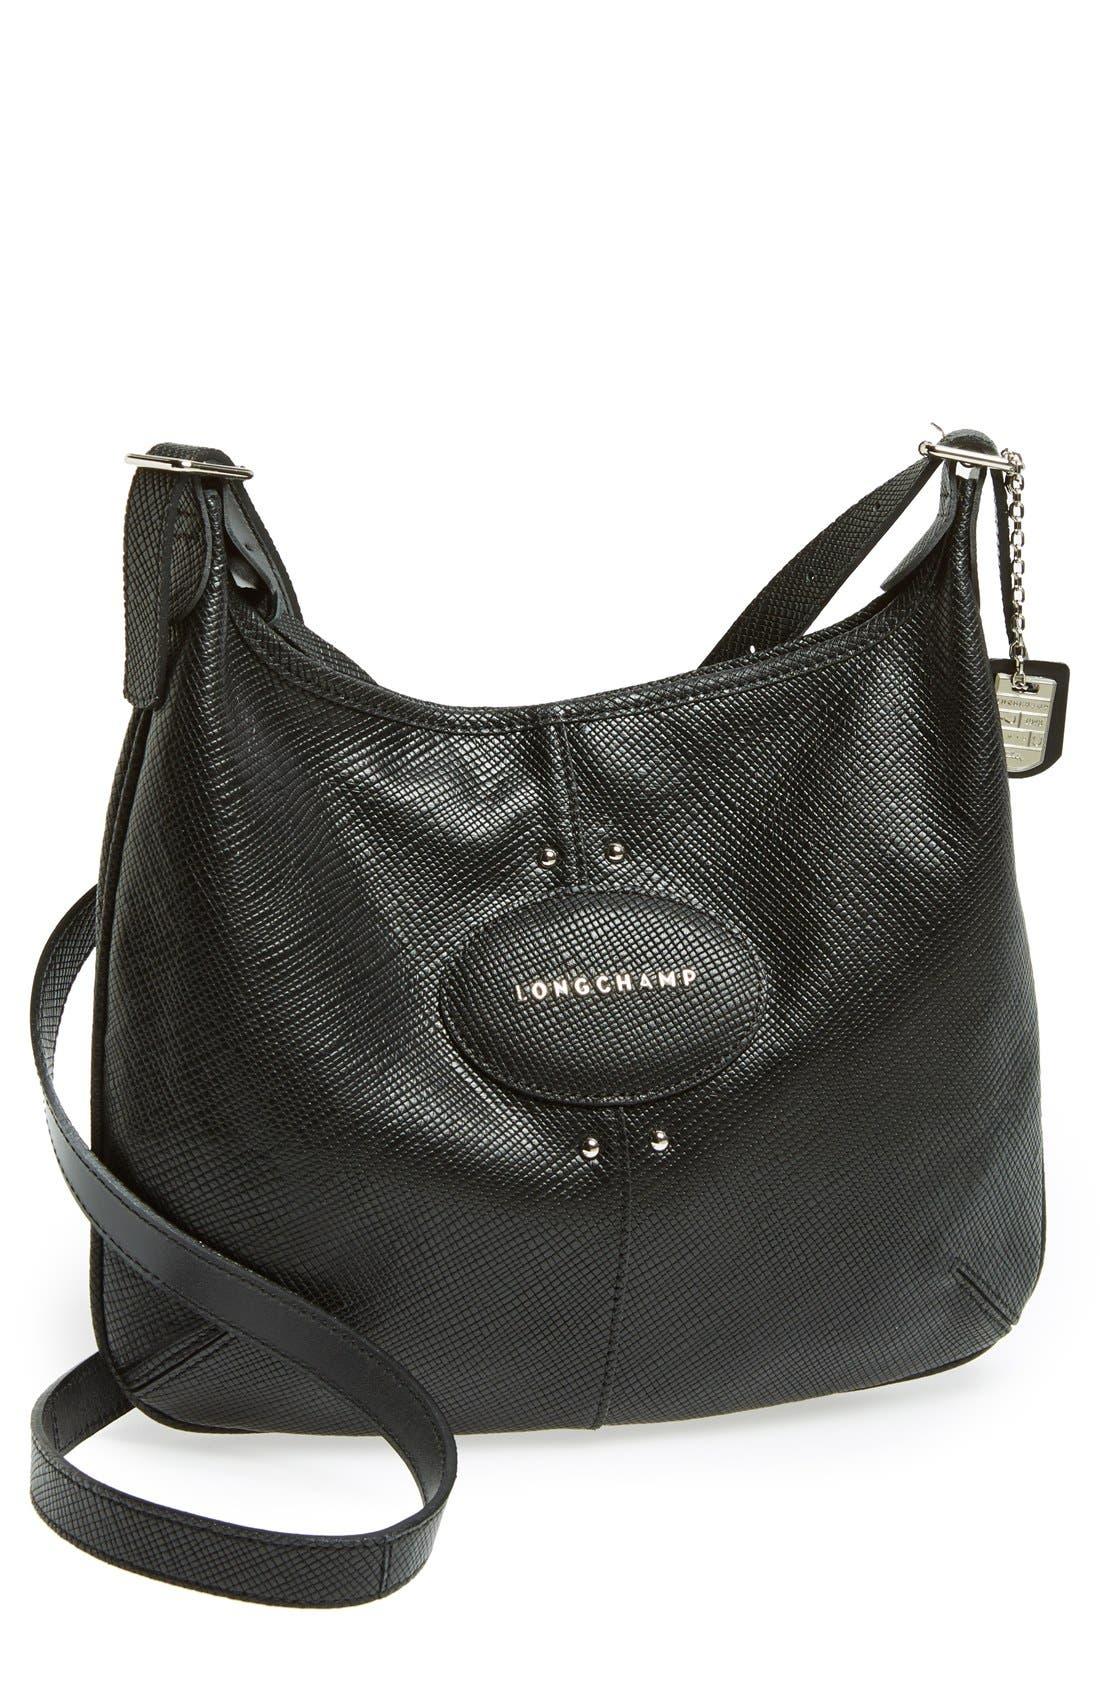 'Quadri' Crossbody Bag, Main, color, 001